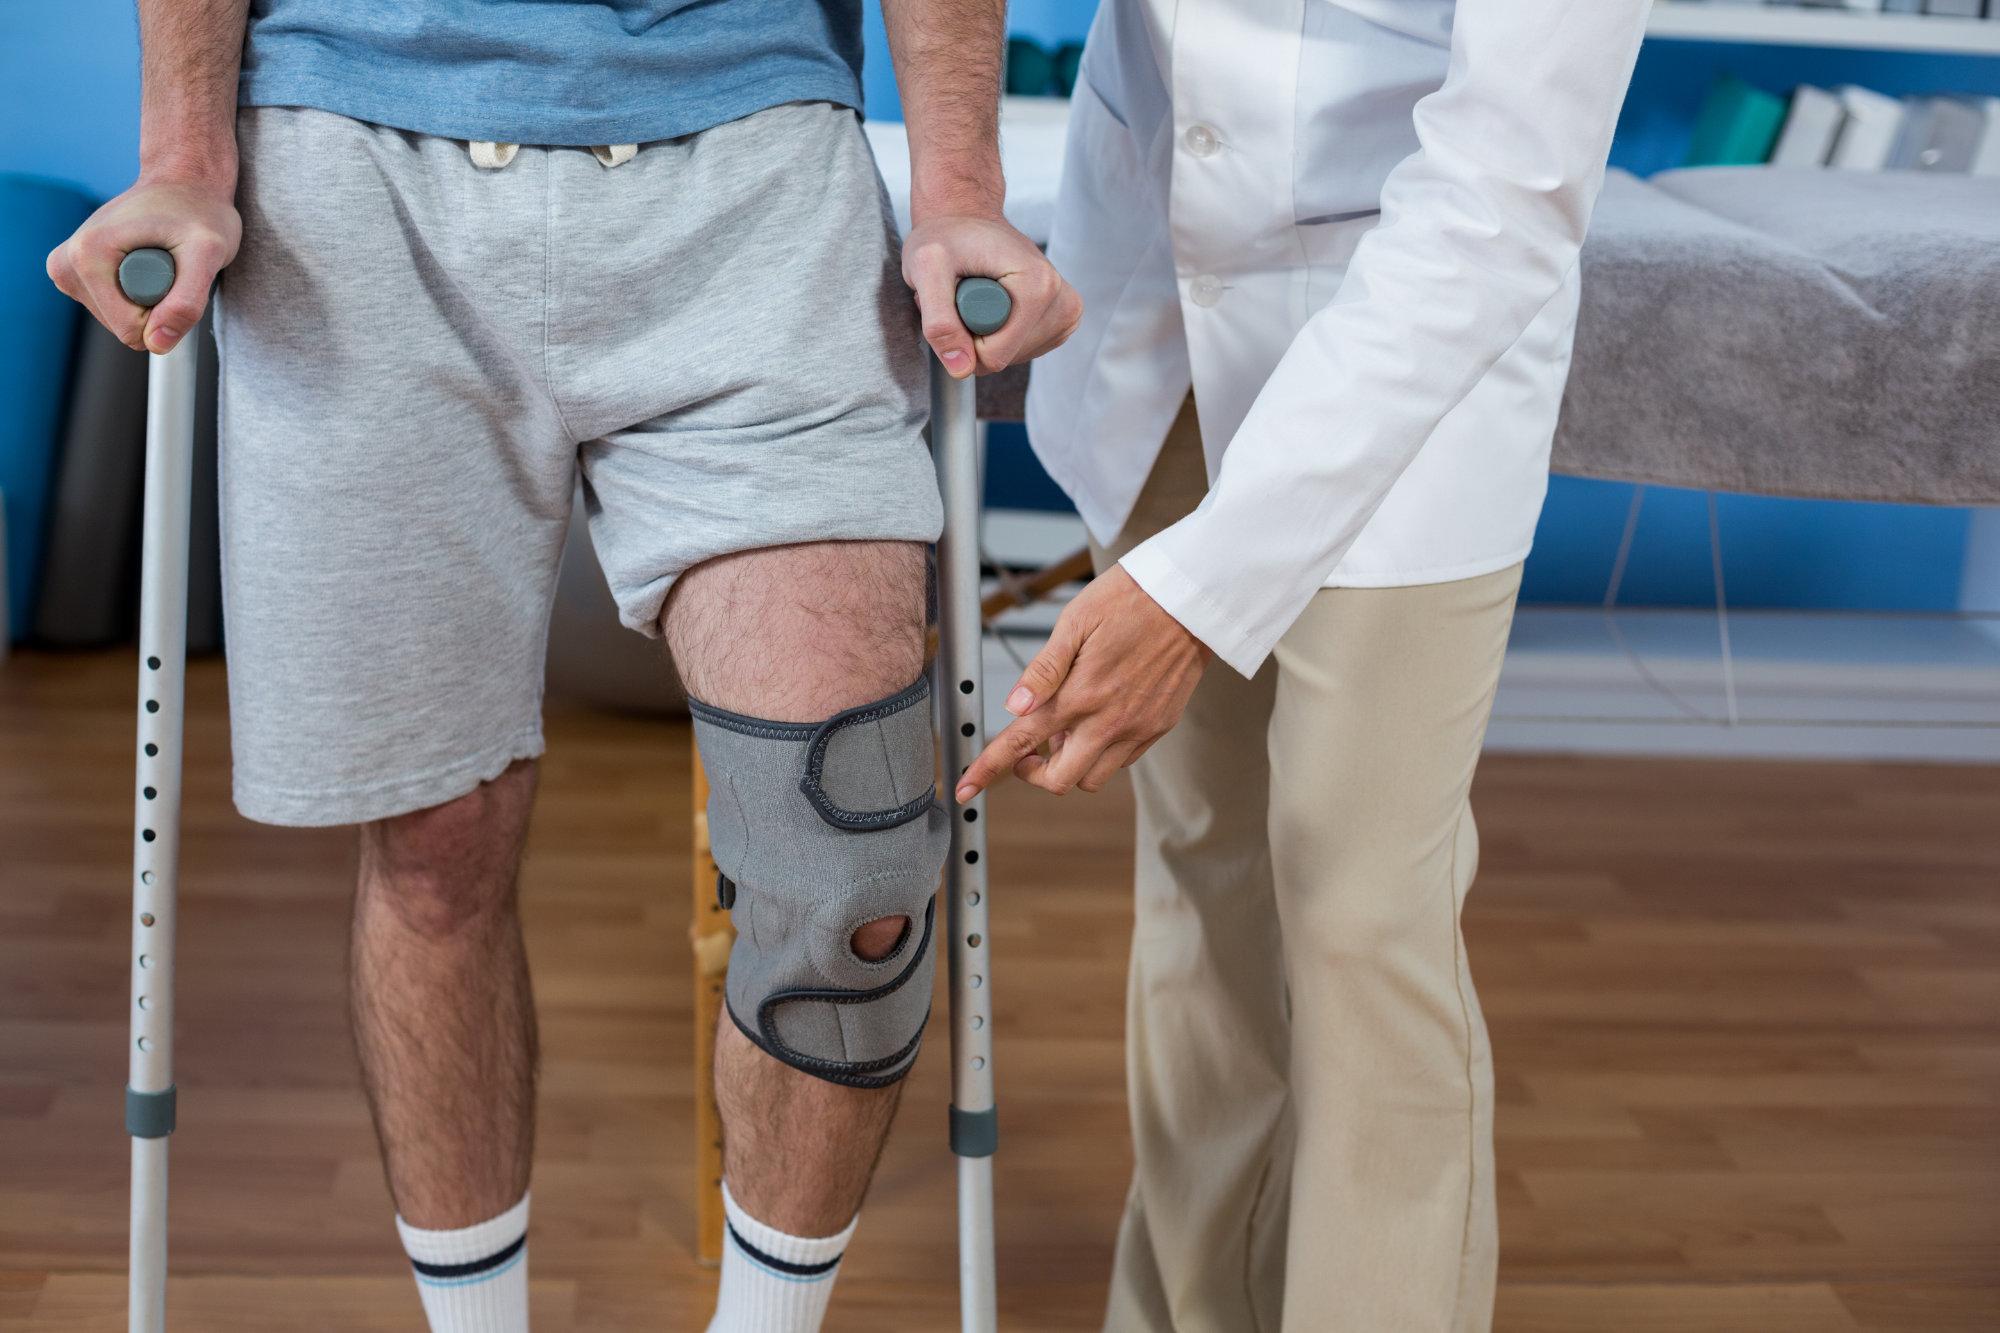 Rehabilitation-Physio-ART-Basel